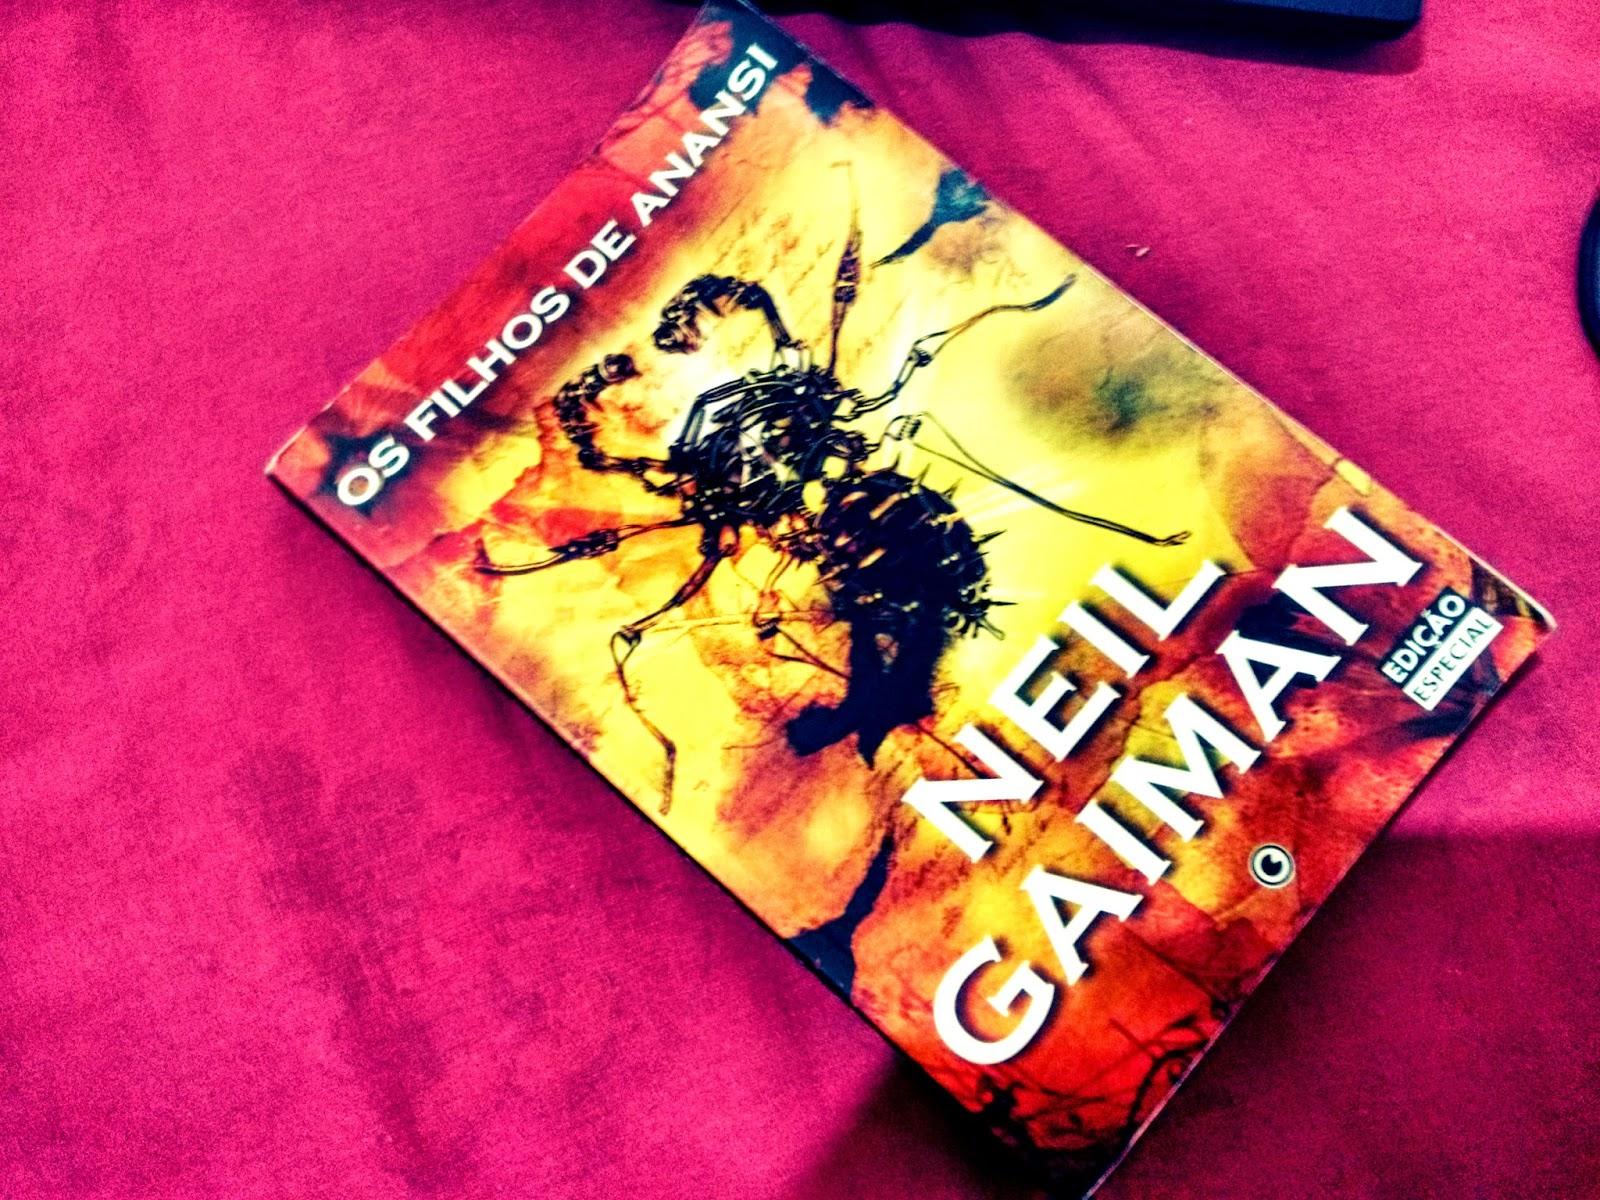 i%C3%A7lfdsk%C3%A7fsa - Os Filhos de Anansi - Neil Gaiman